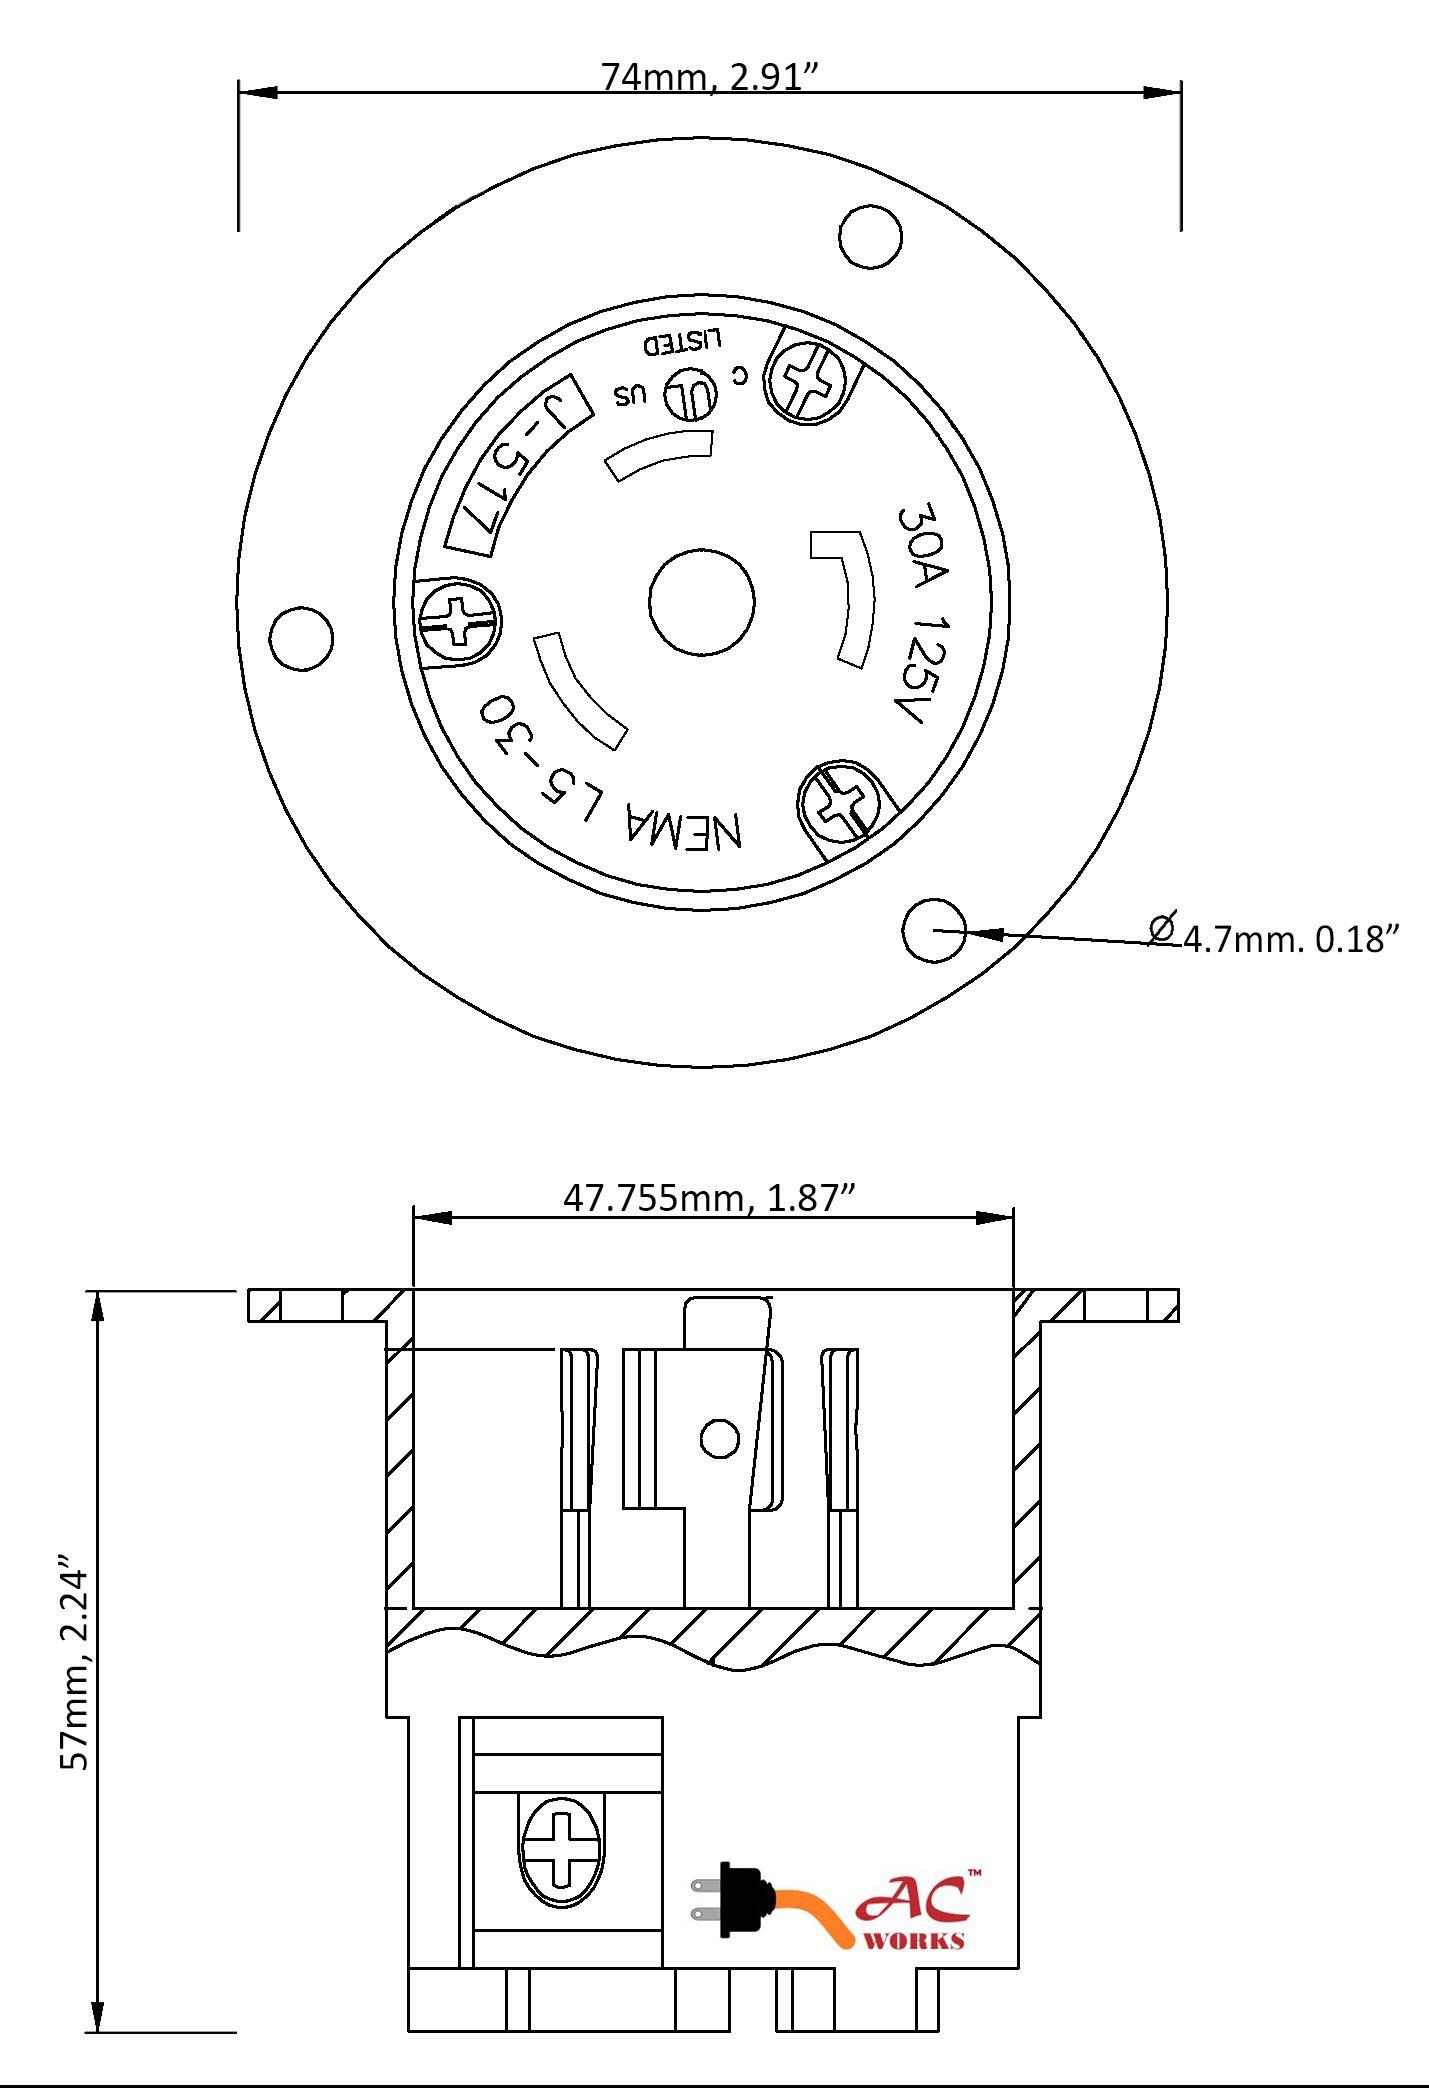 AC WORKS ASINL530P 30-Amp 125-Volt NEMA L5-30P Flanged Power Input Inlet by AC WORKS (Image #3)